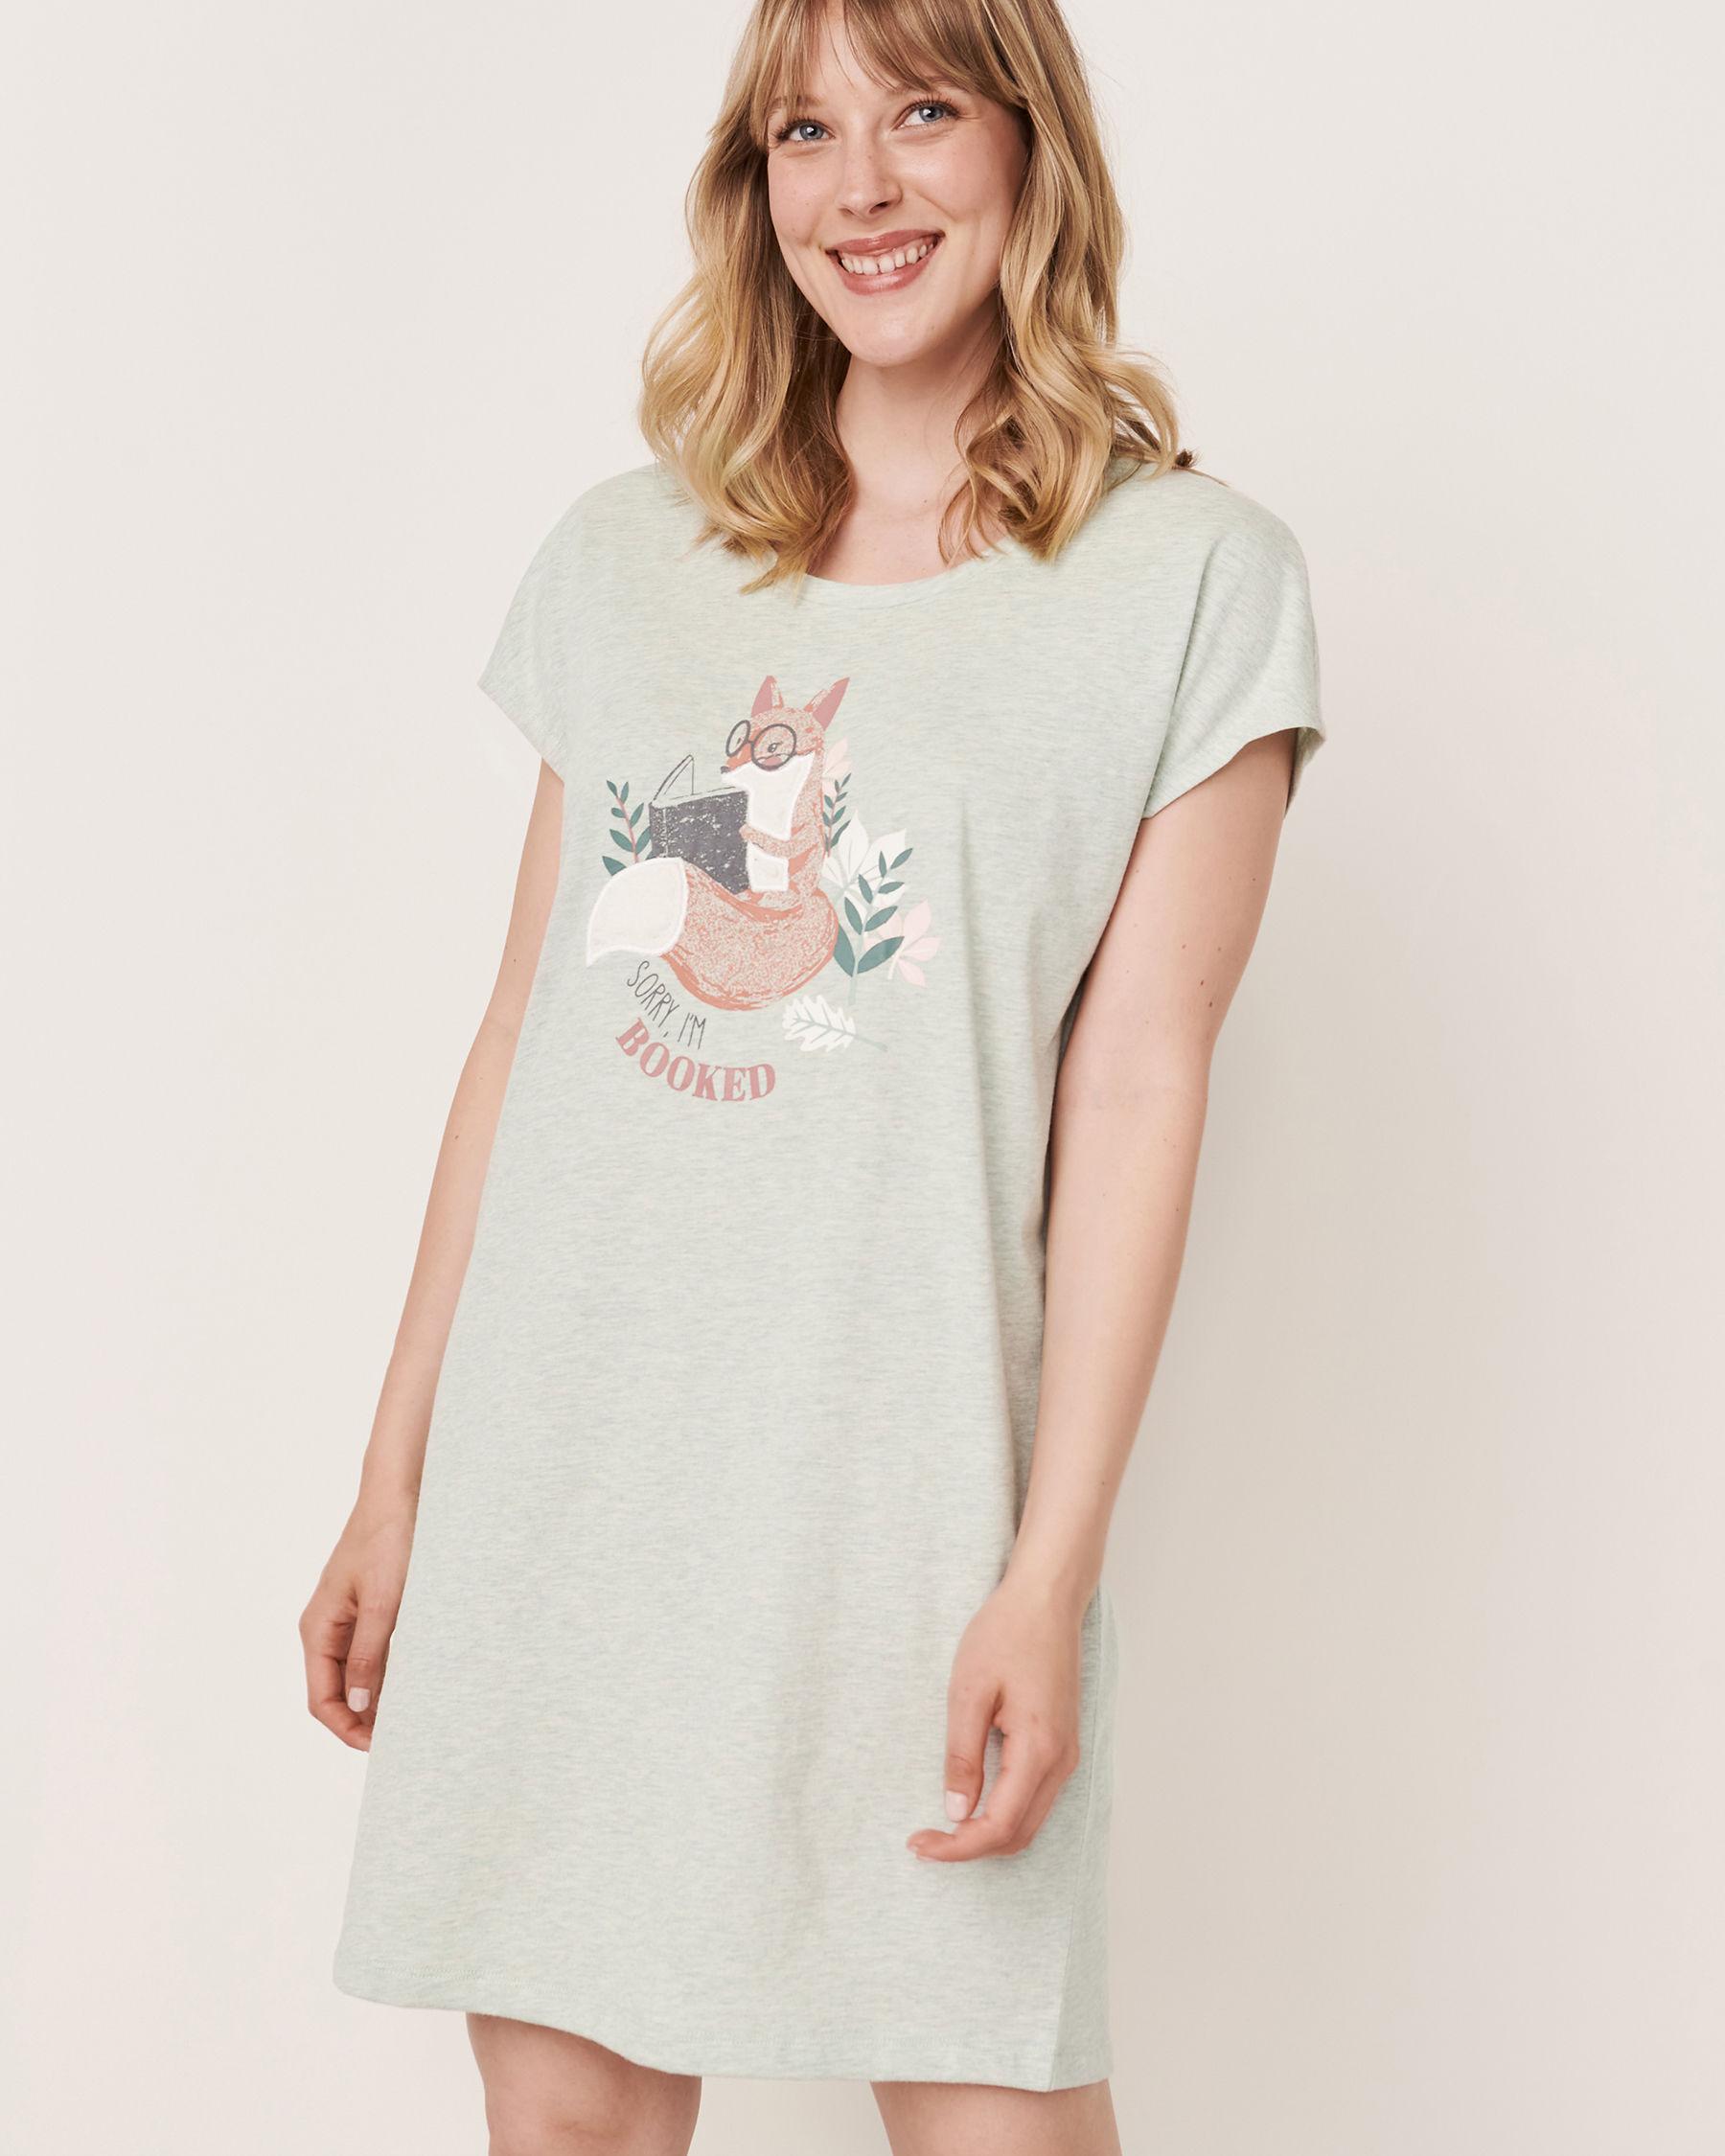 LA VIE EN ROSE Embroidered Detail  Scoop Neck Short Sleeve Sleepshirt Grey-blue 40500071 - View1